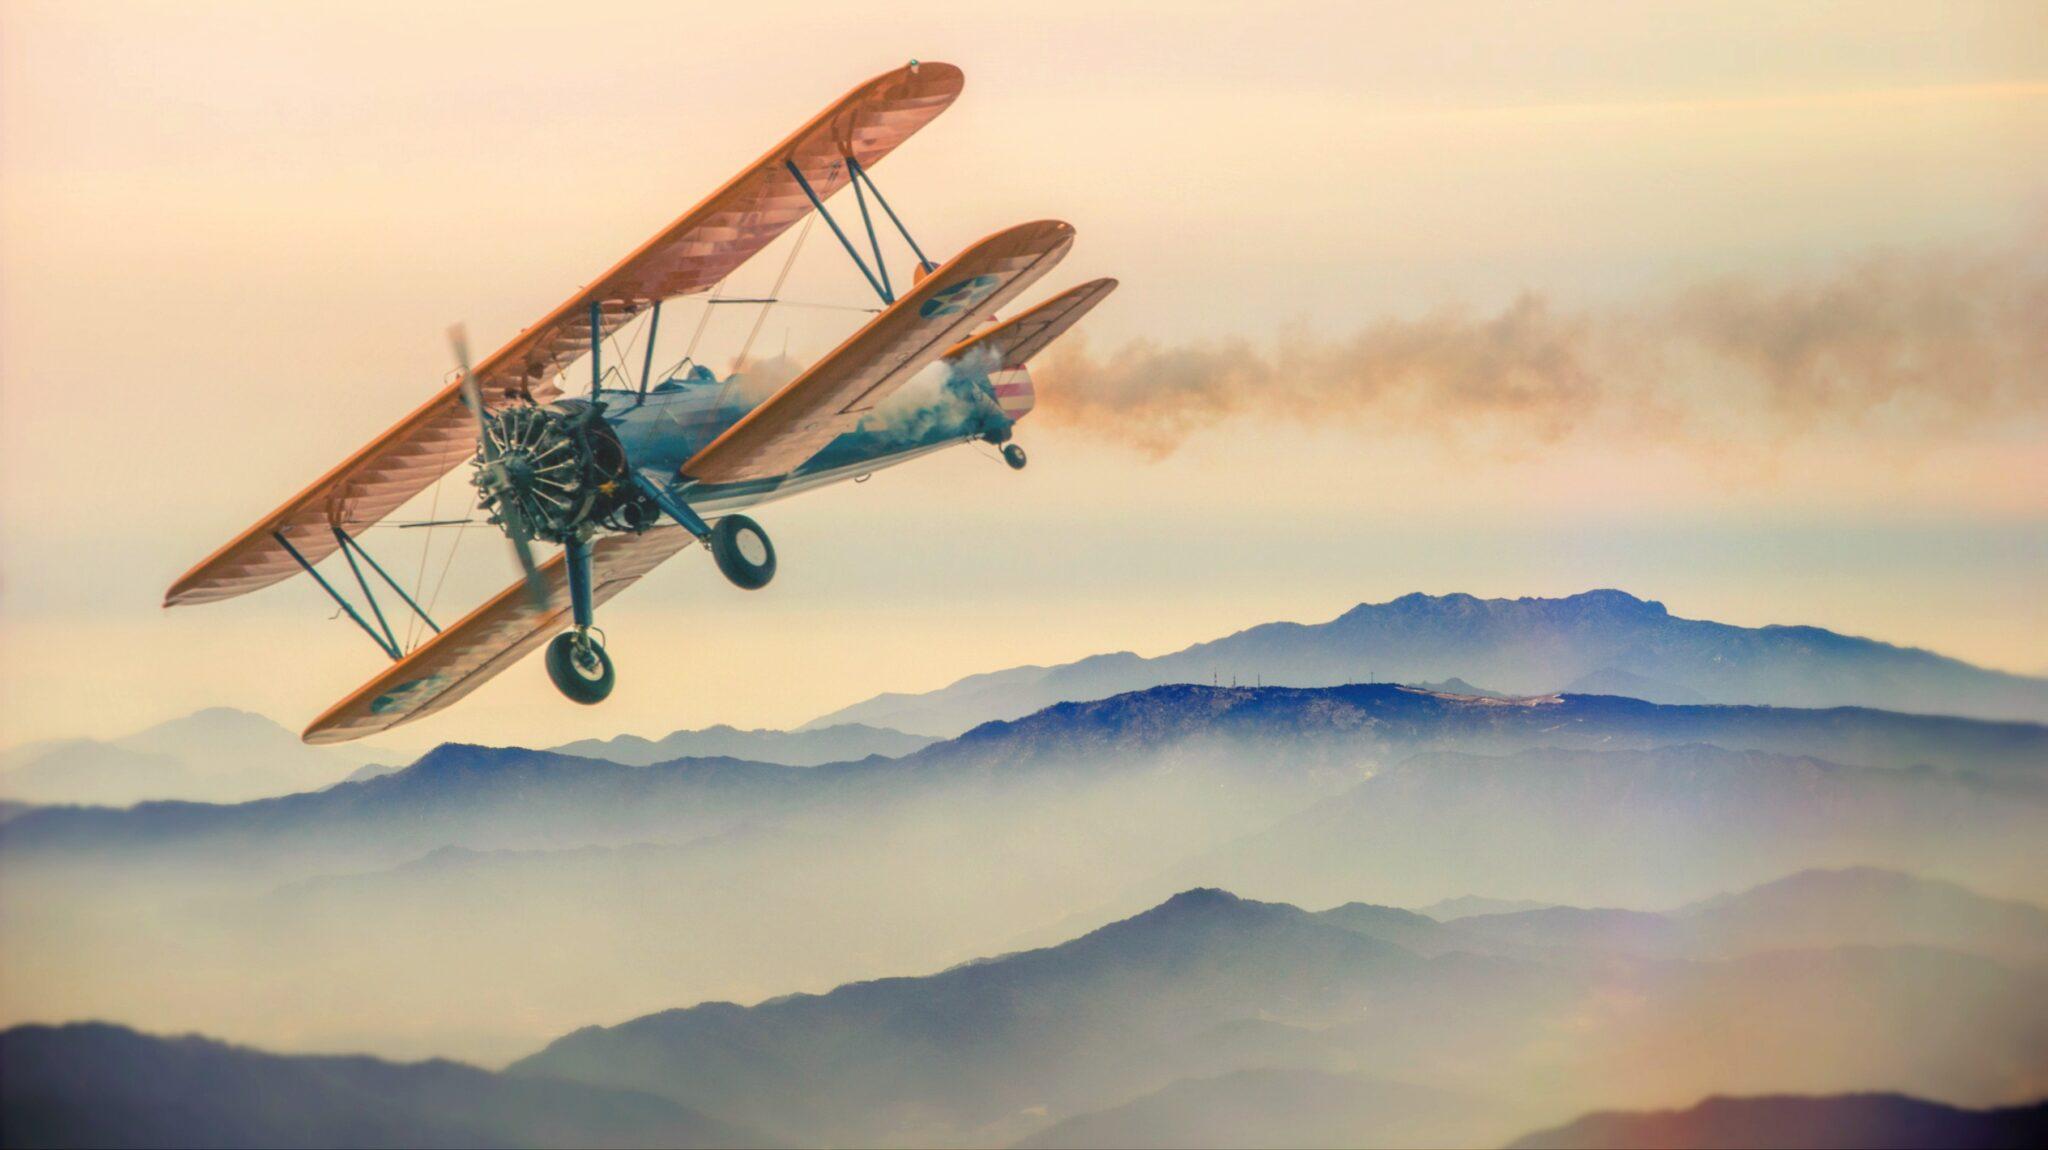 L'Histoire de l'aviation en bref